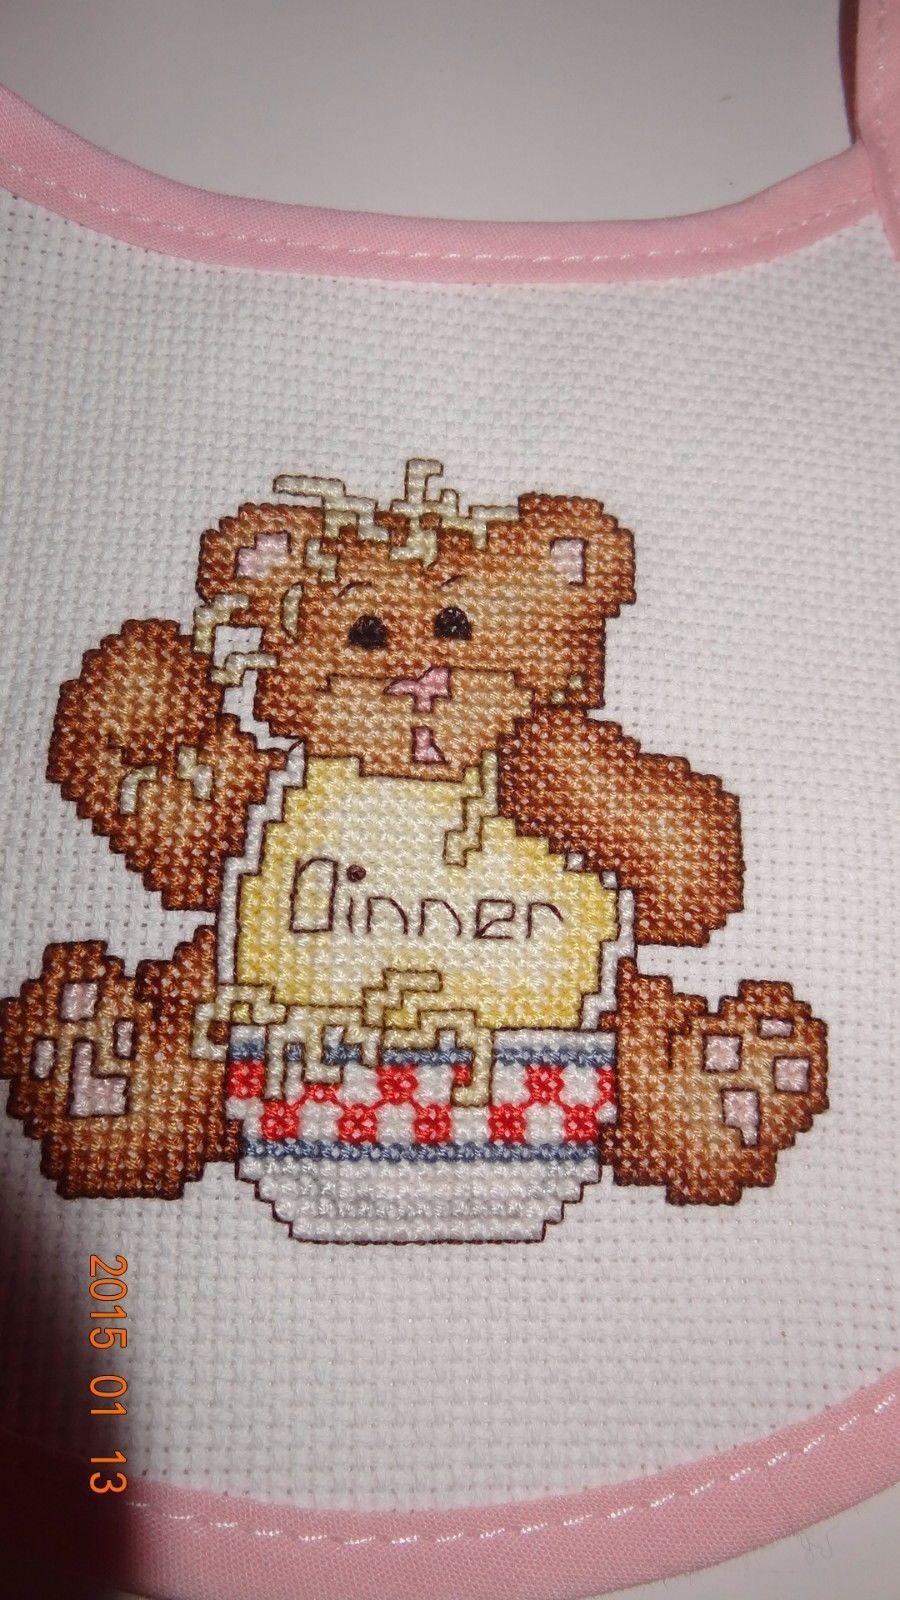 Baby Girl's Bib Teddy Bear messy eater Finished Cross Stitch Pink